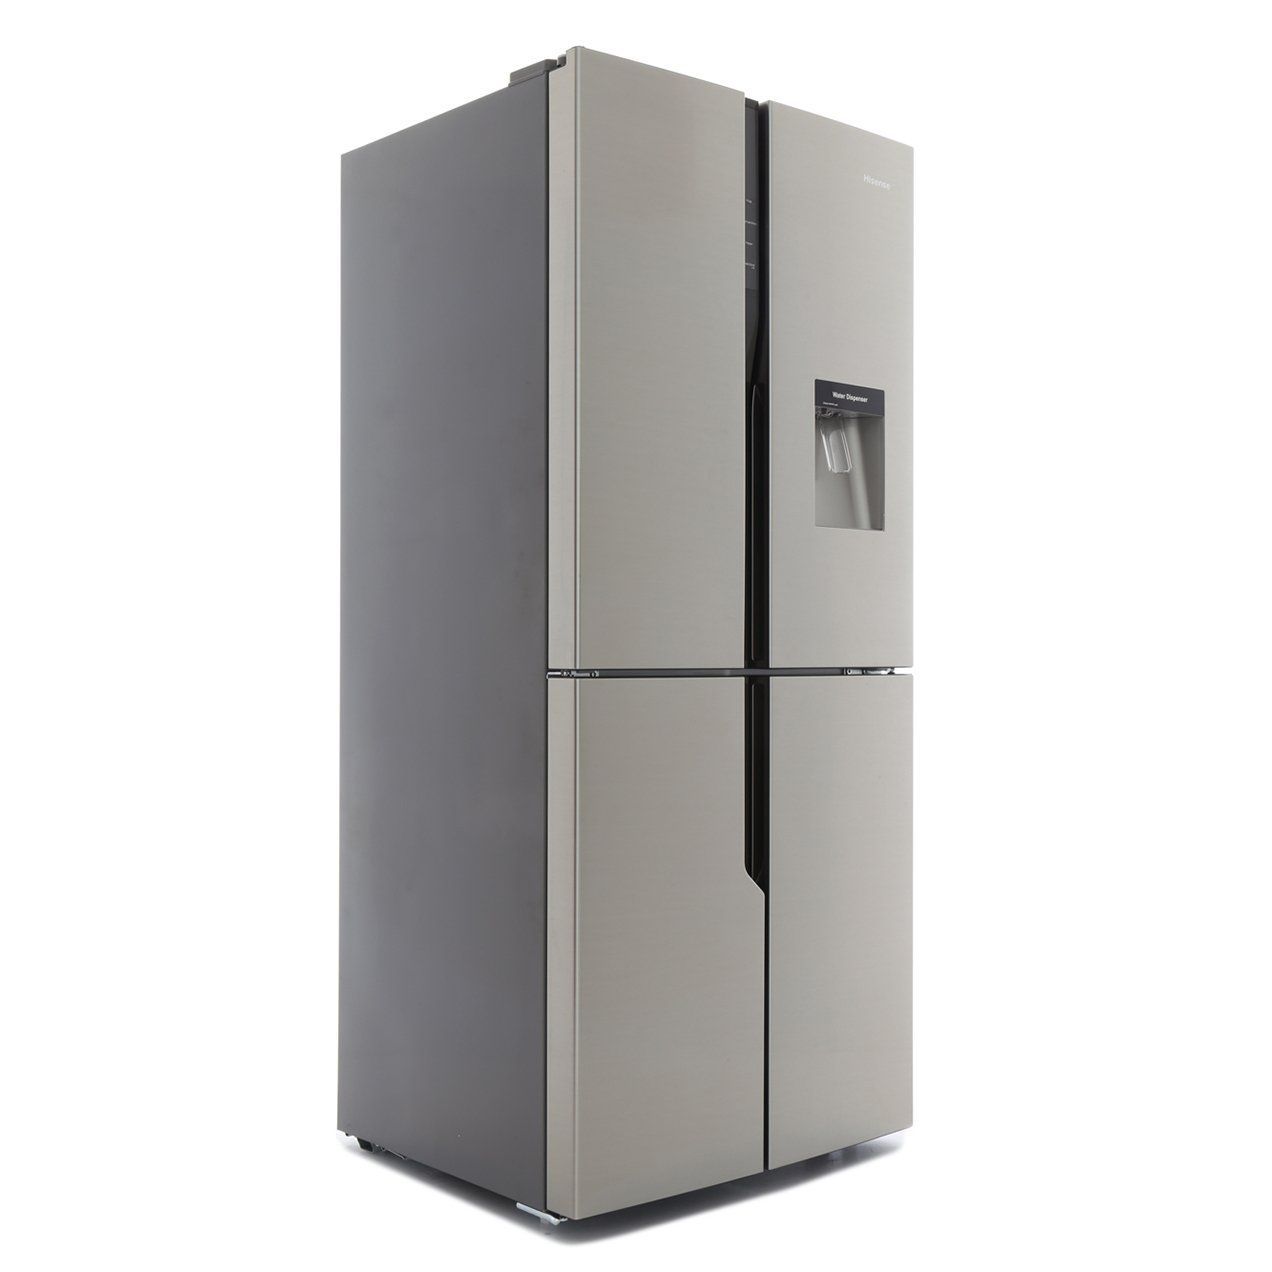 Hisense RQ560N4WC1 American Fridge Freezer